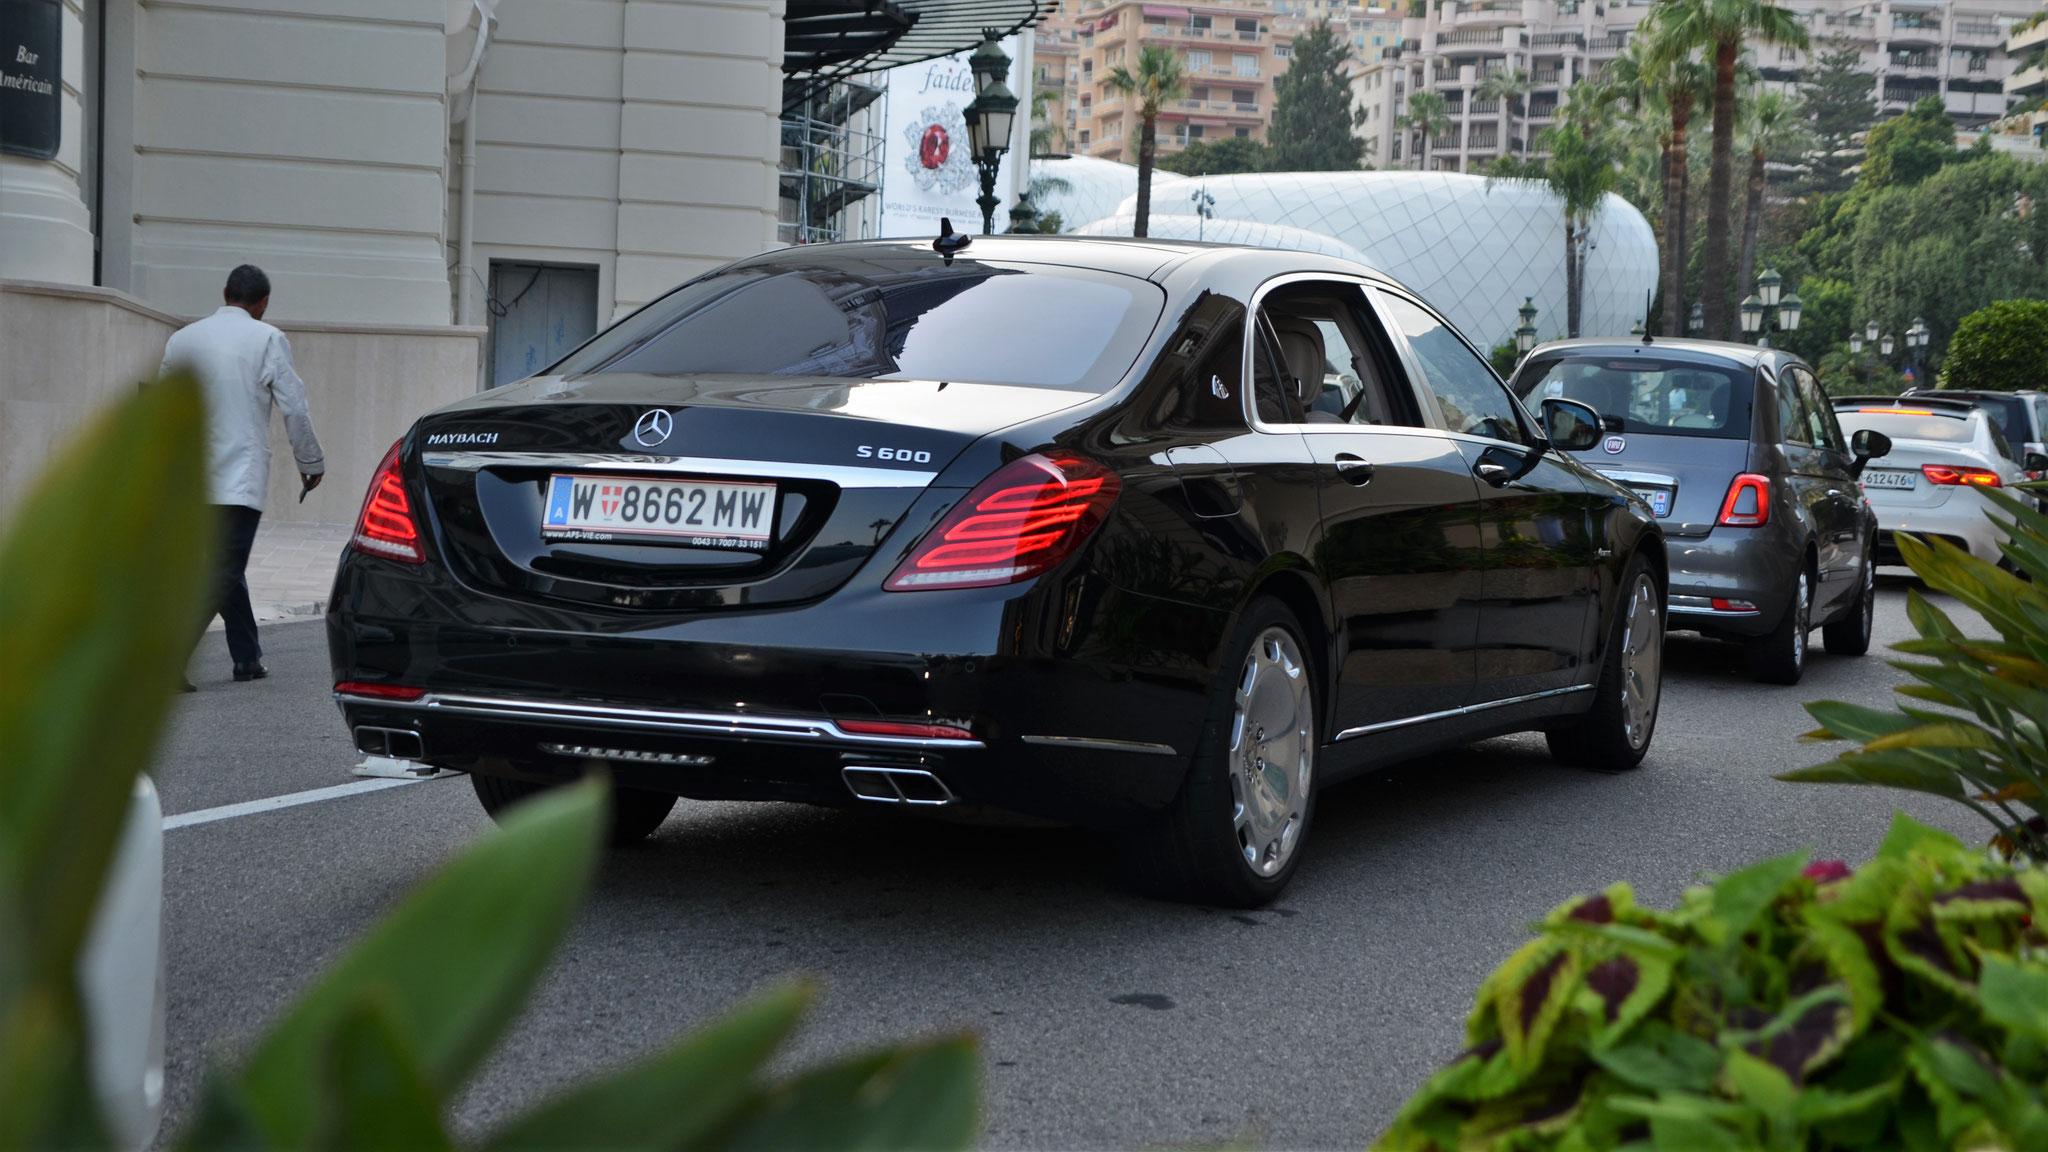 Mercedes Maybach S600 - W-8662-MW (AUT)